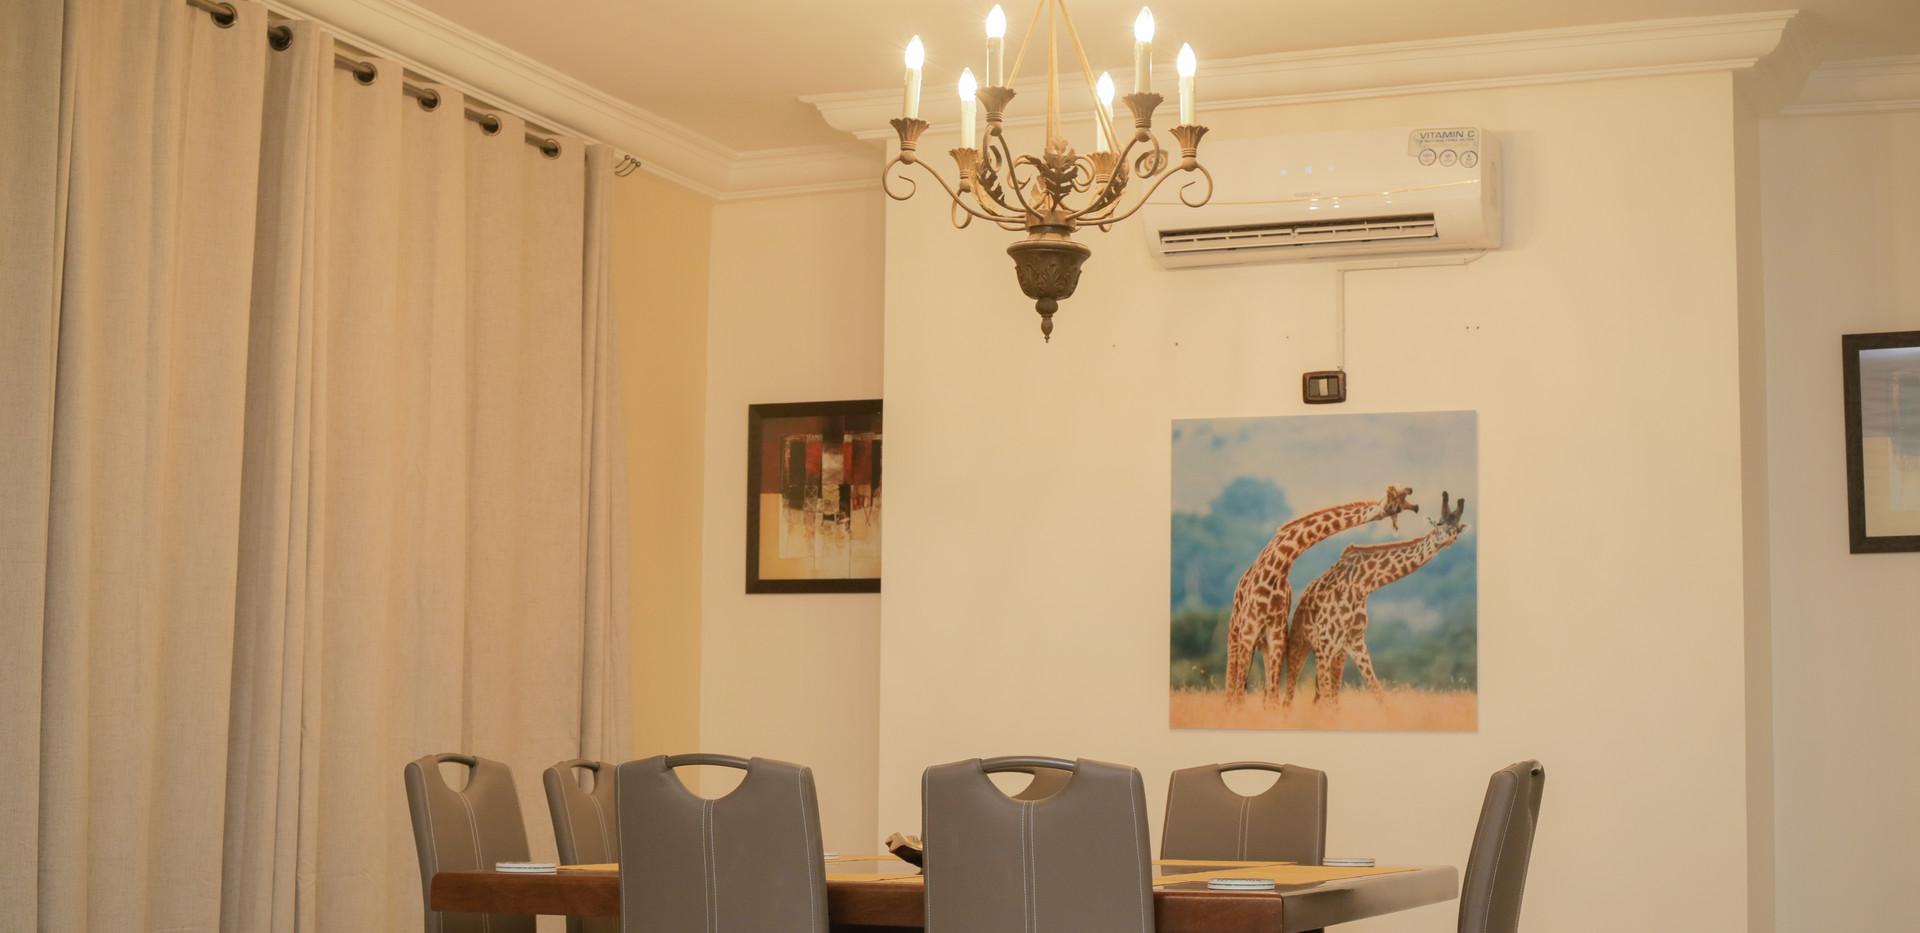 Apartments-50 - Copy.JPG